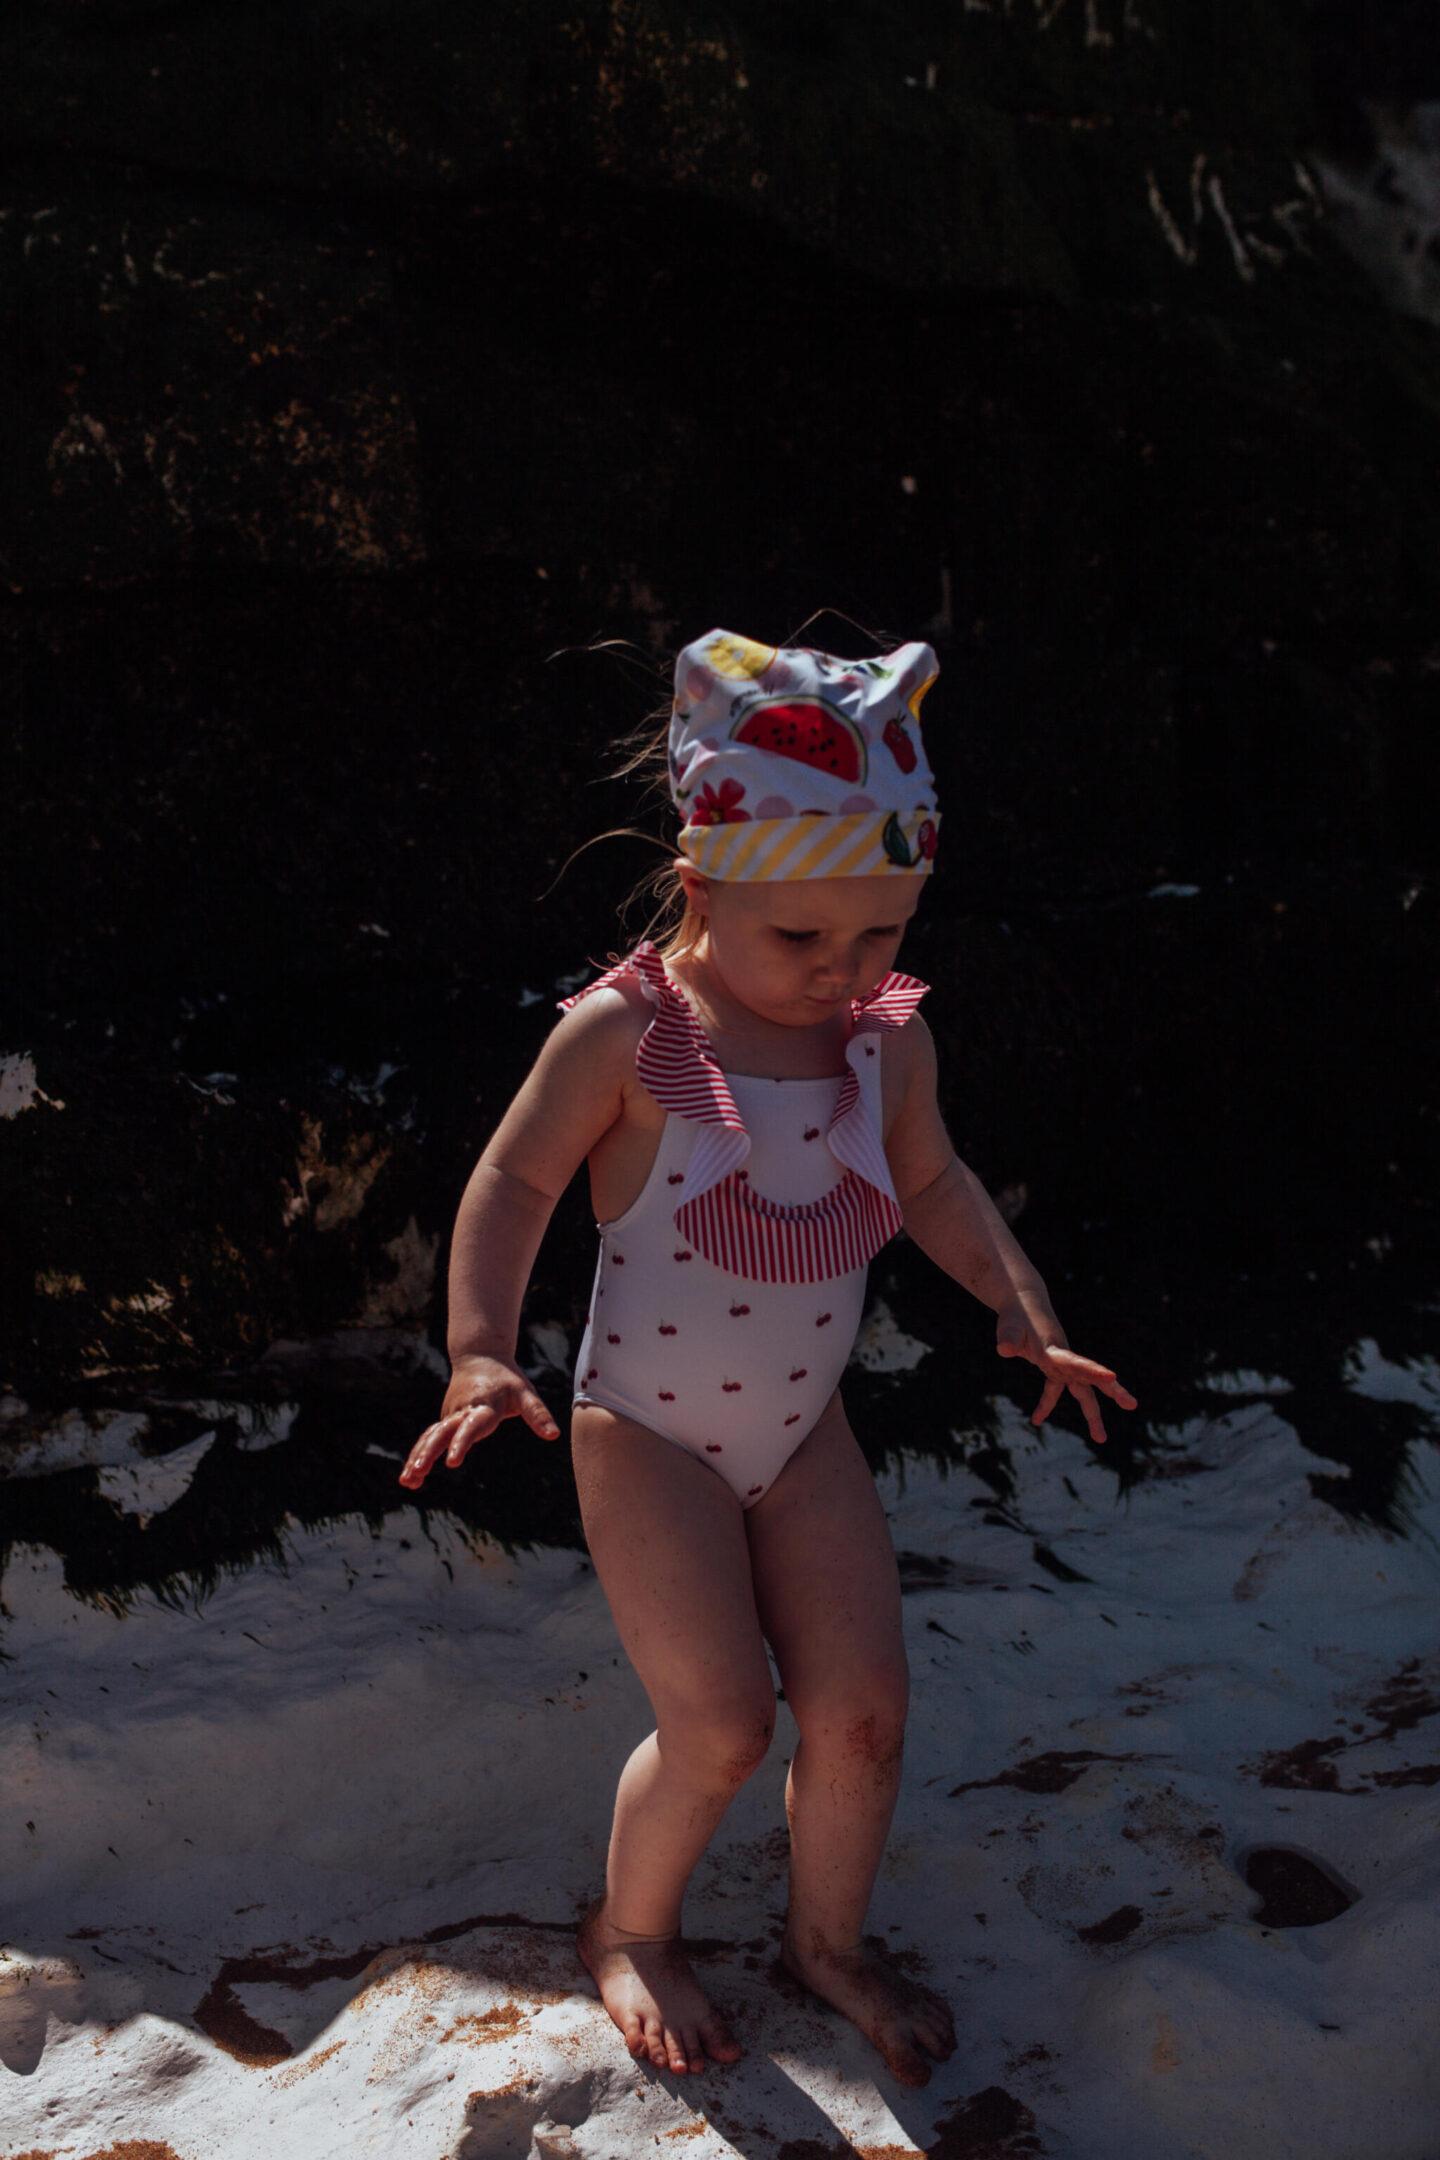 Maria-Bianca-Cherry-Swimsuit-03